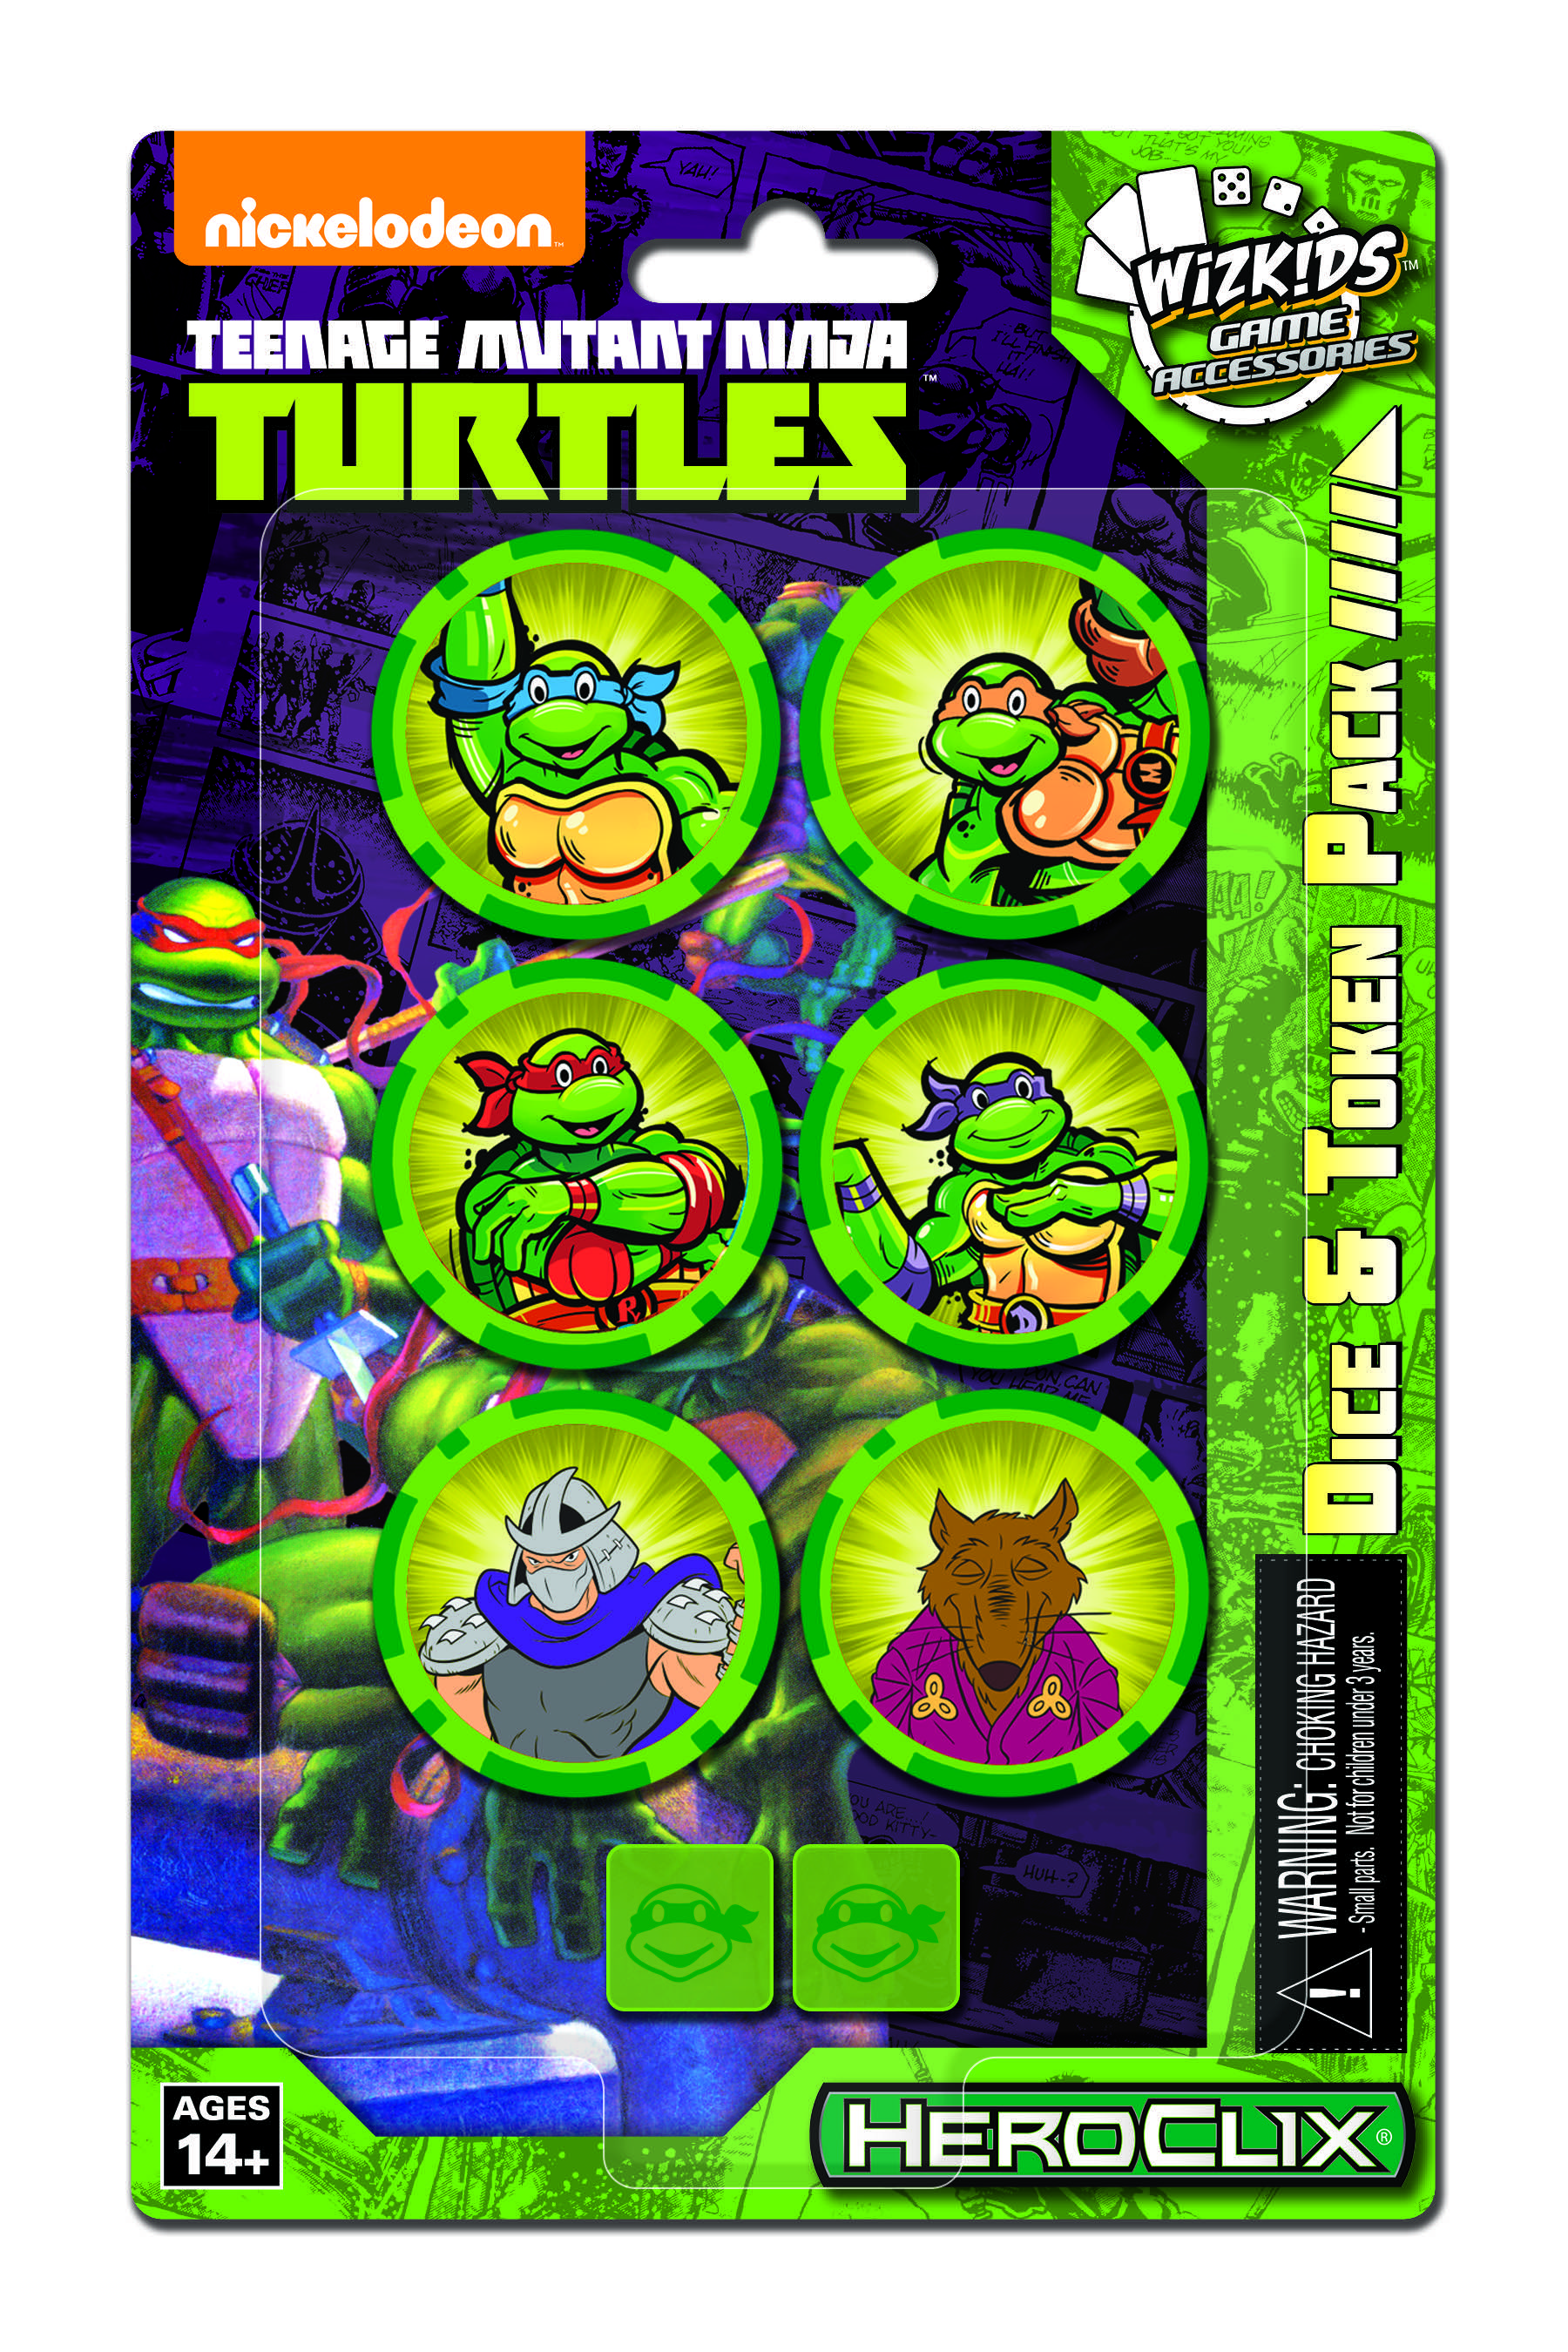 Teenage Mutant Ninja Turtles Heroclix: Dice & Token Pack Box Front